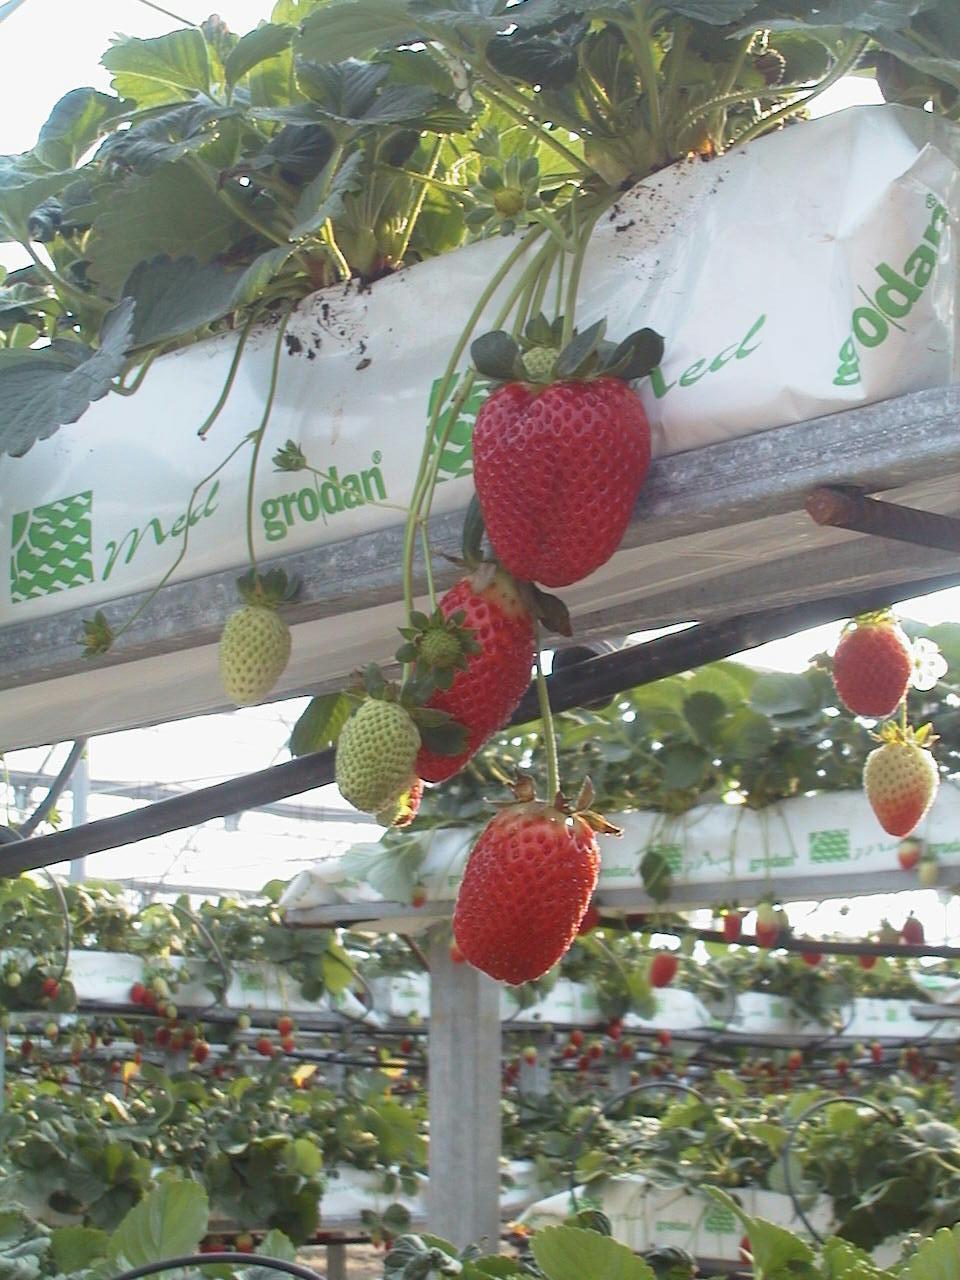 Fitosofia cultivo de fresas en lana de roca - Lana de roca precio ...